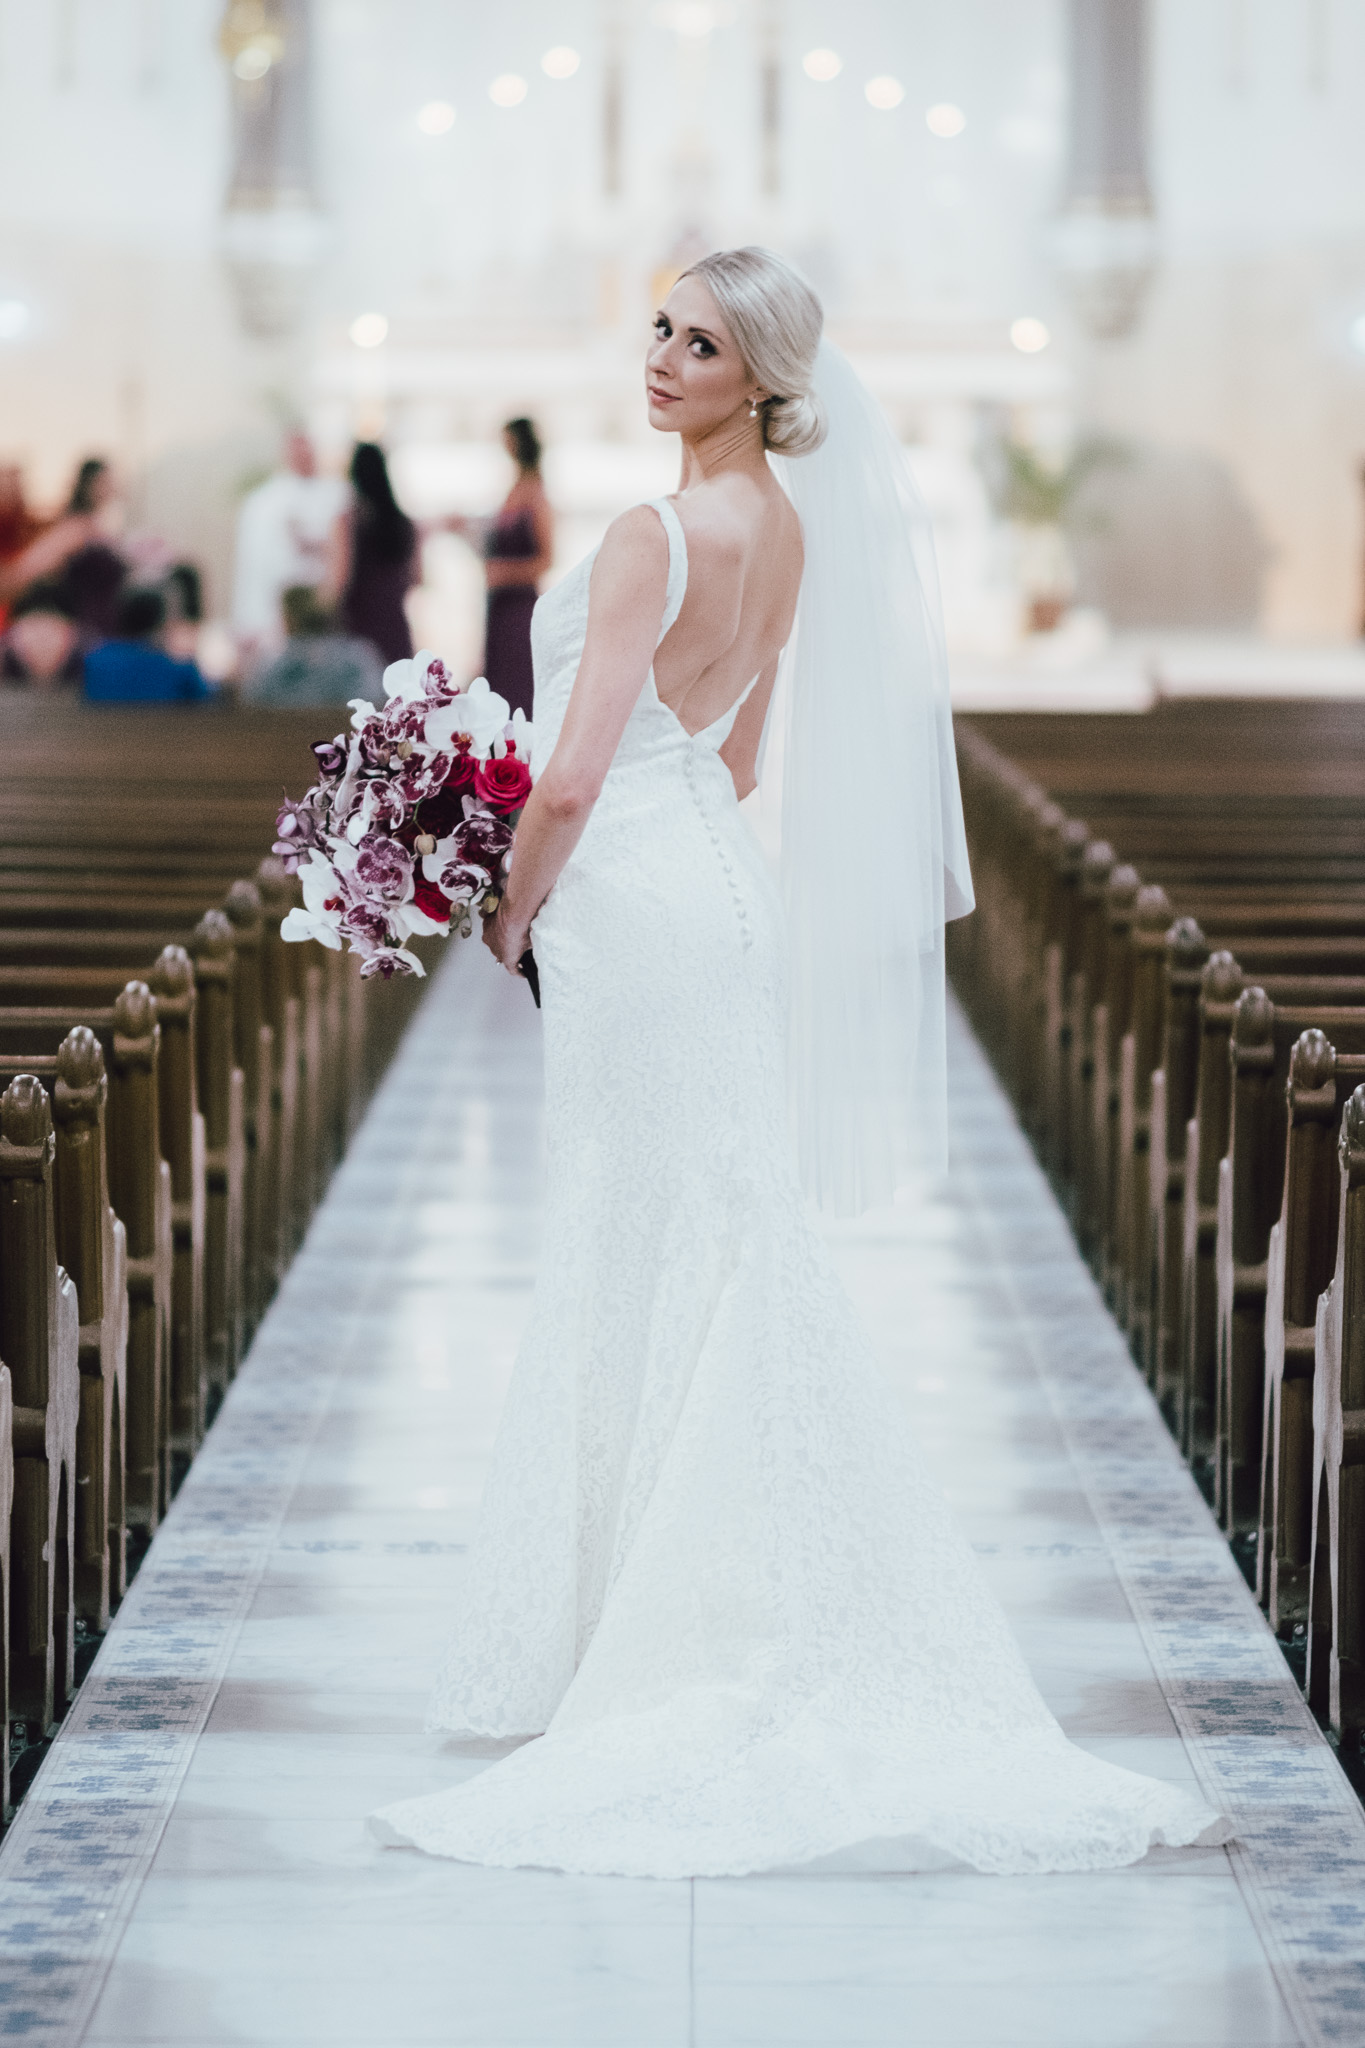 Brooke-Kyle-Indianapolis-Wedding-Blog-103.jpg